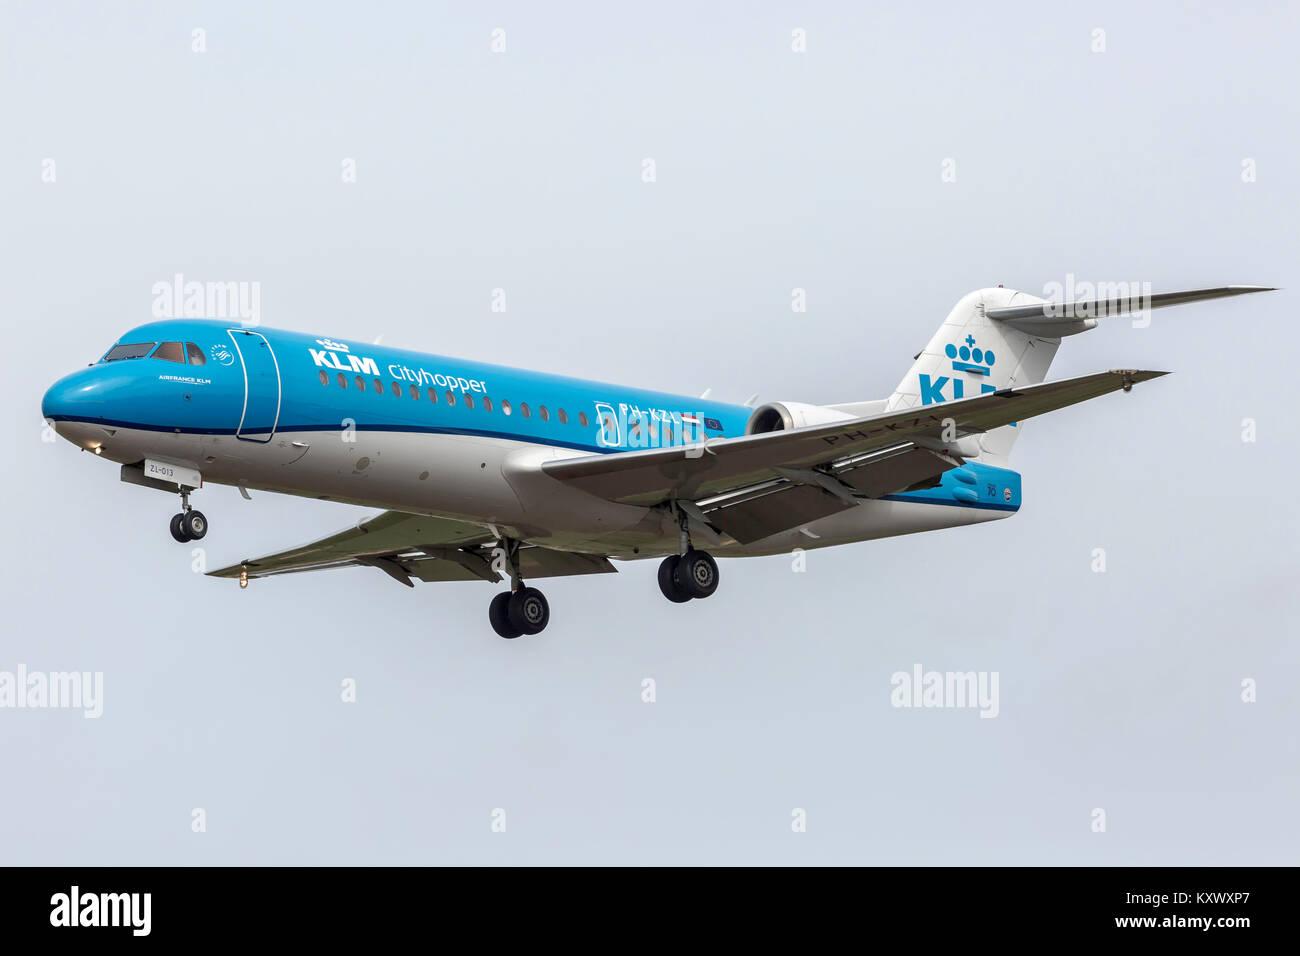 KLM Cityhopper Fokker F-70 landing at Newcastle Airport - Stock Image